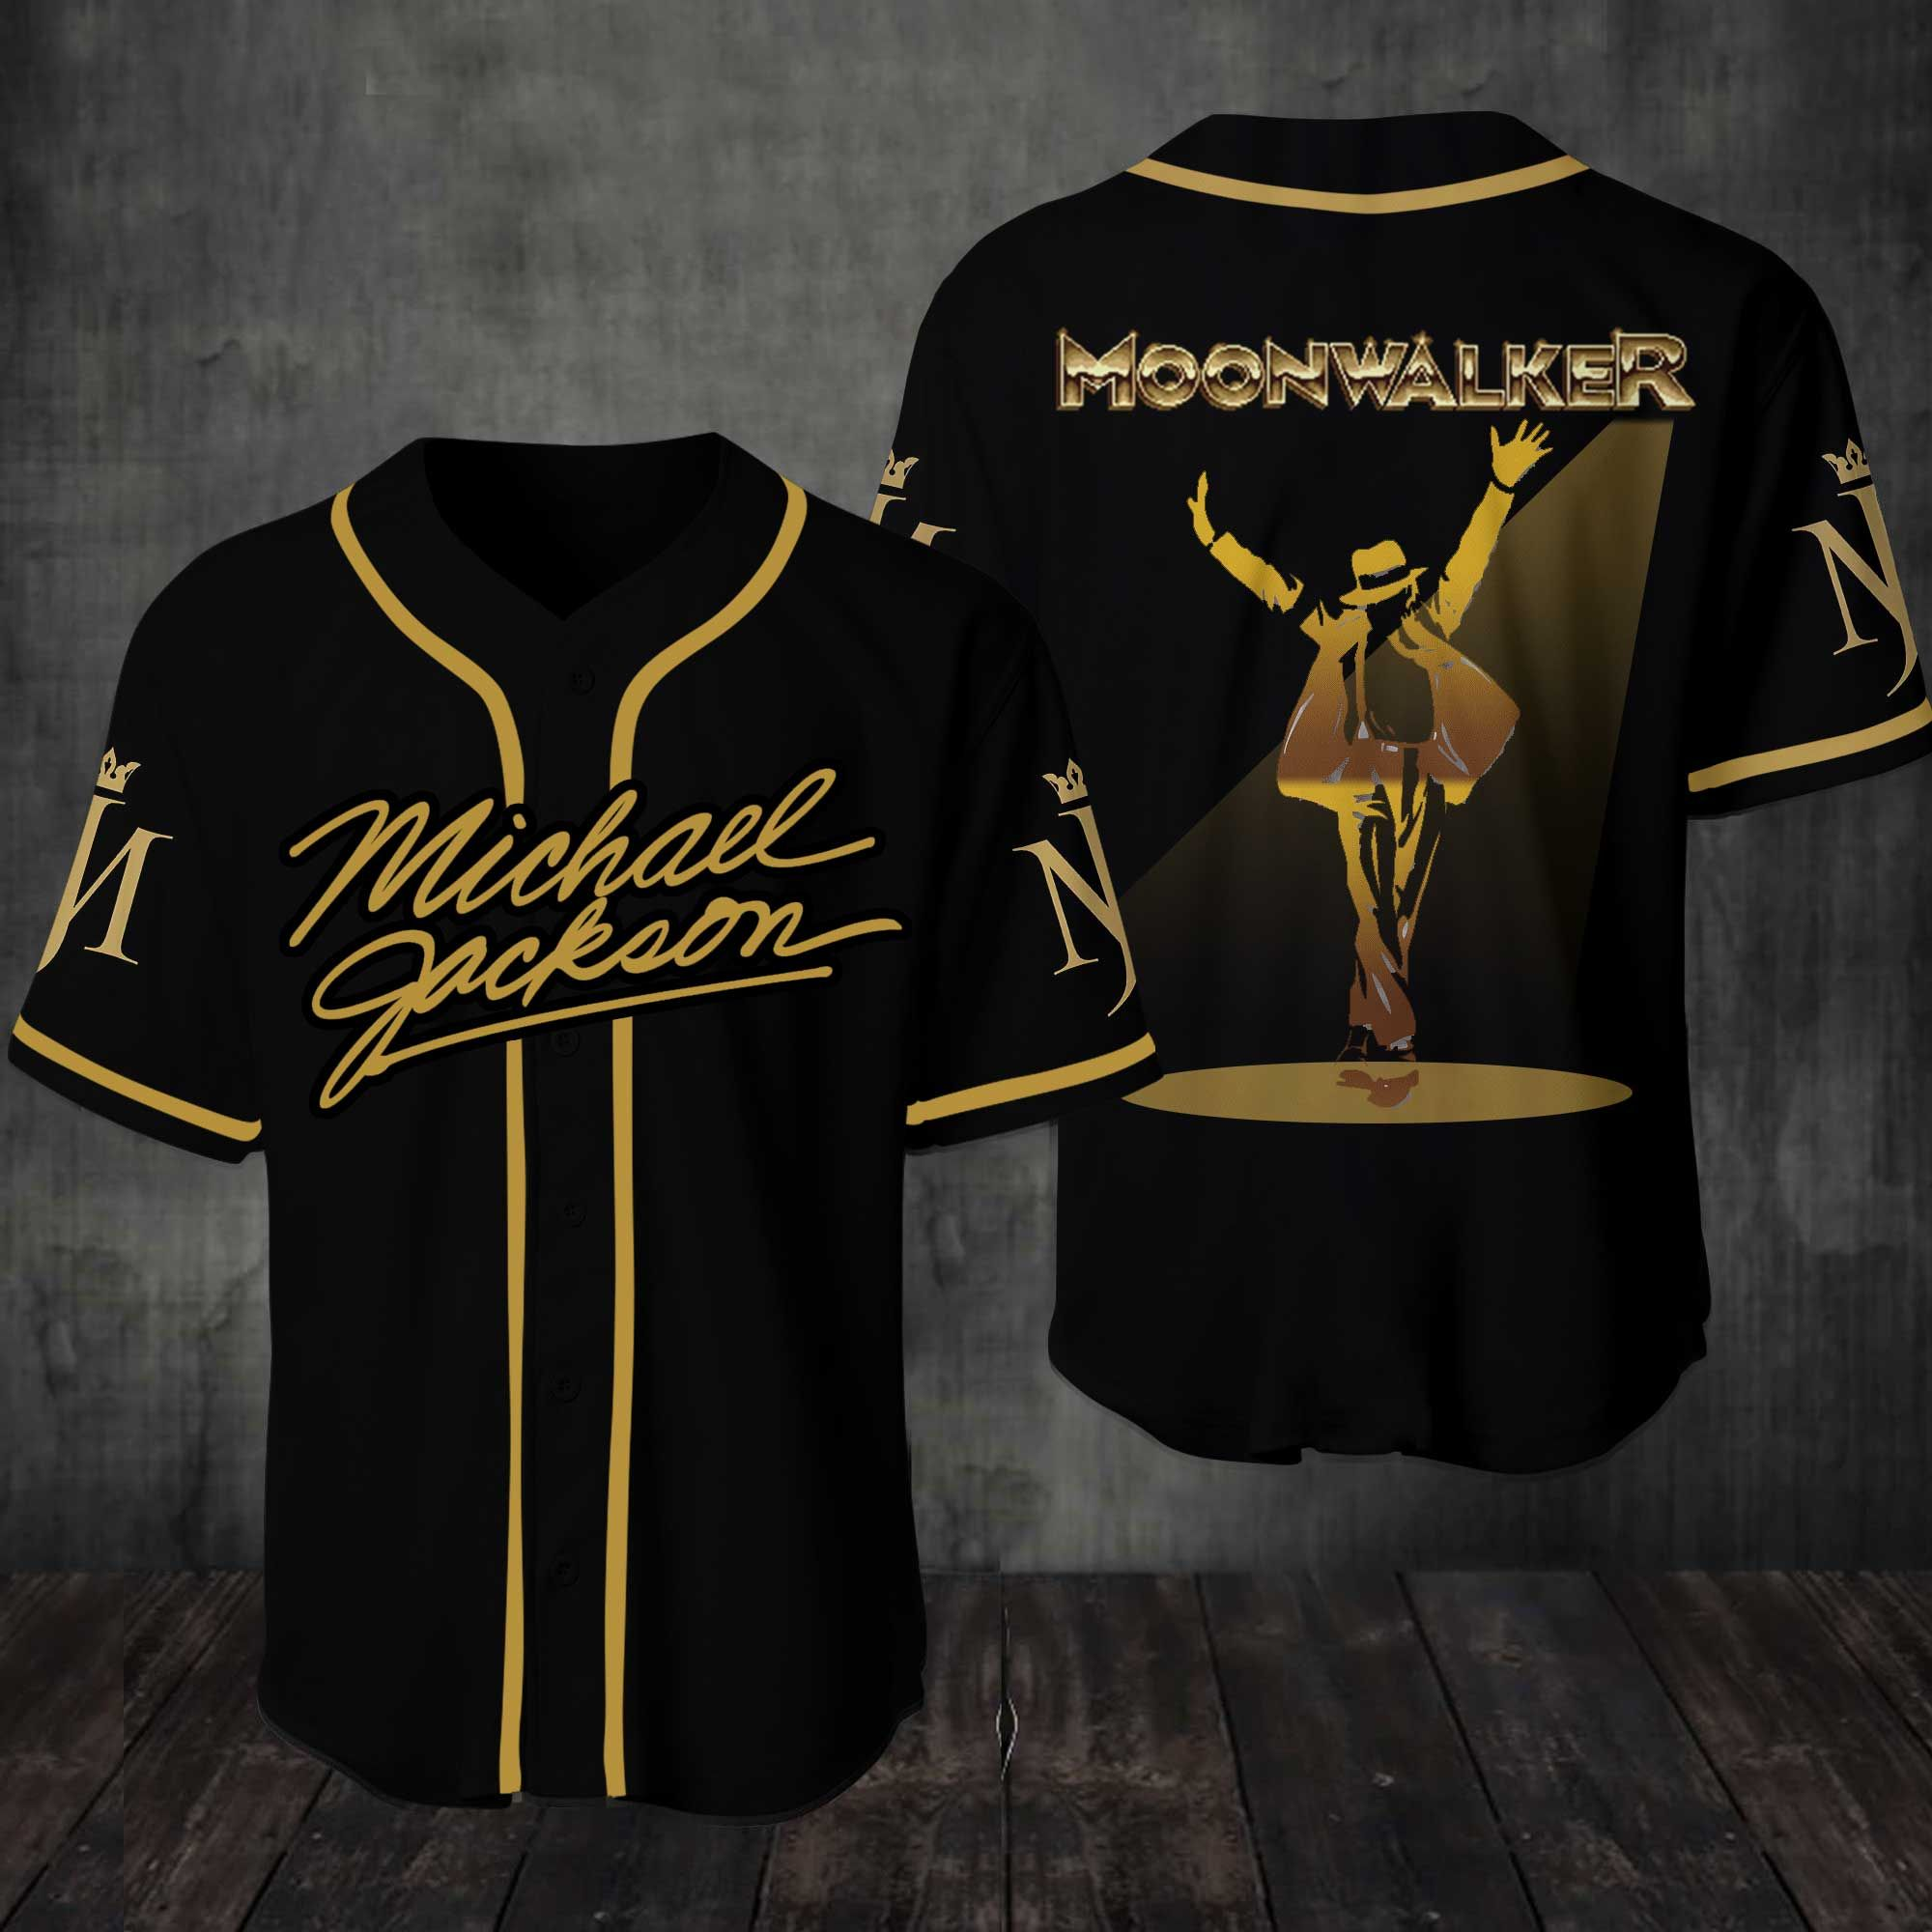 Michael Jackson Mooonwalker Baseball Jersey Shirt